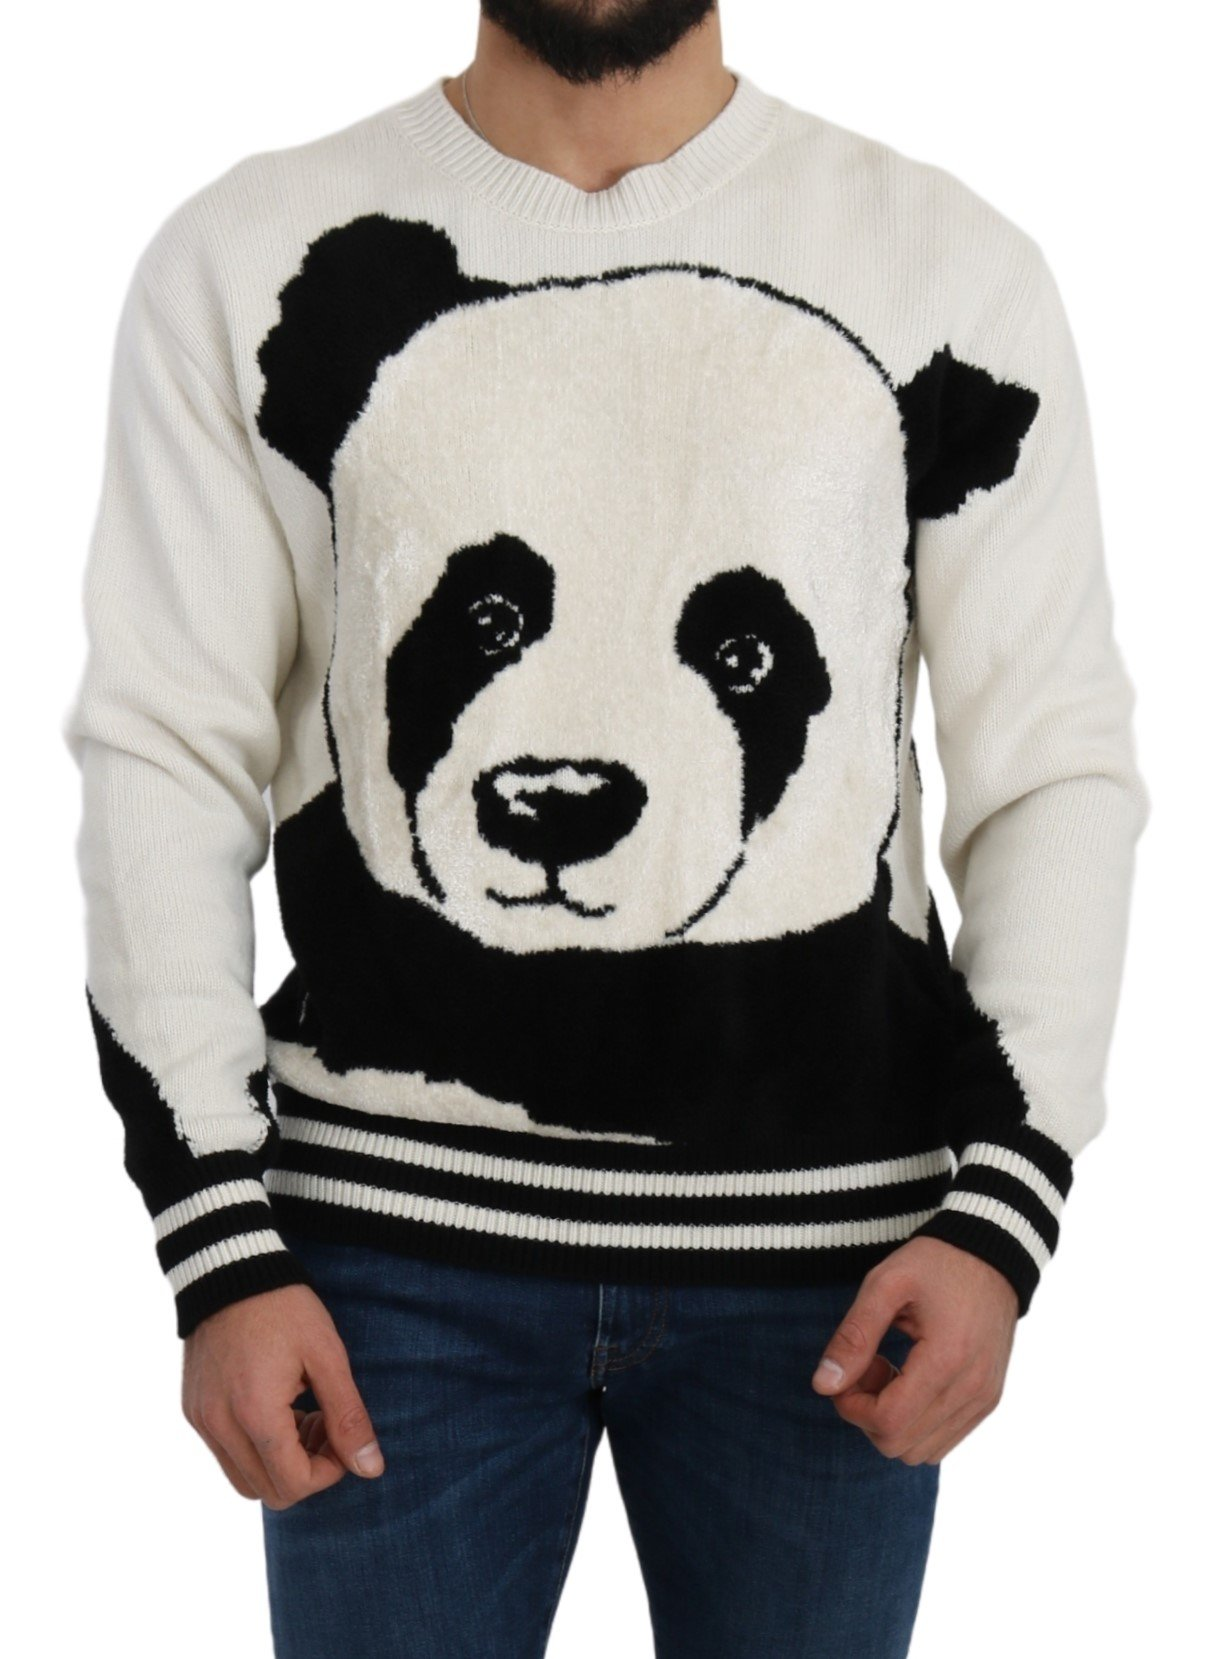 Dolce & Gabbana Men's Cashmere Panda Knit Sweater White TSH5210 - IT48   M